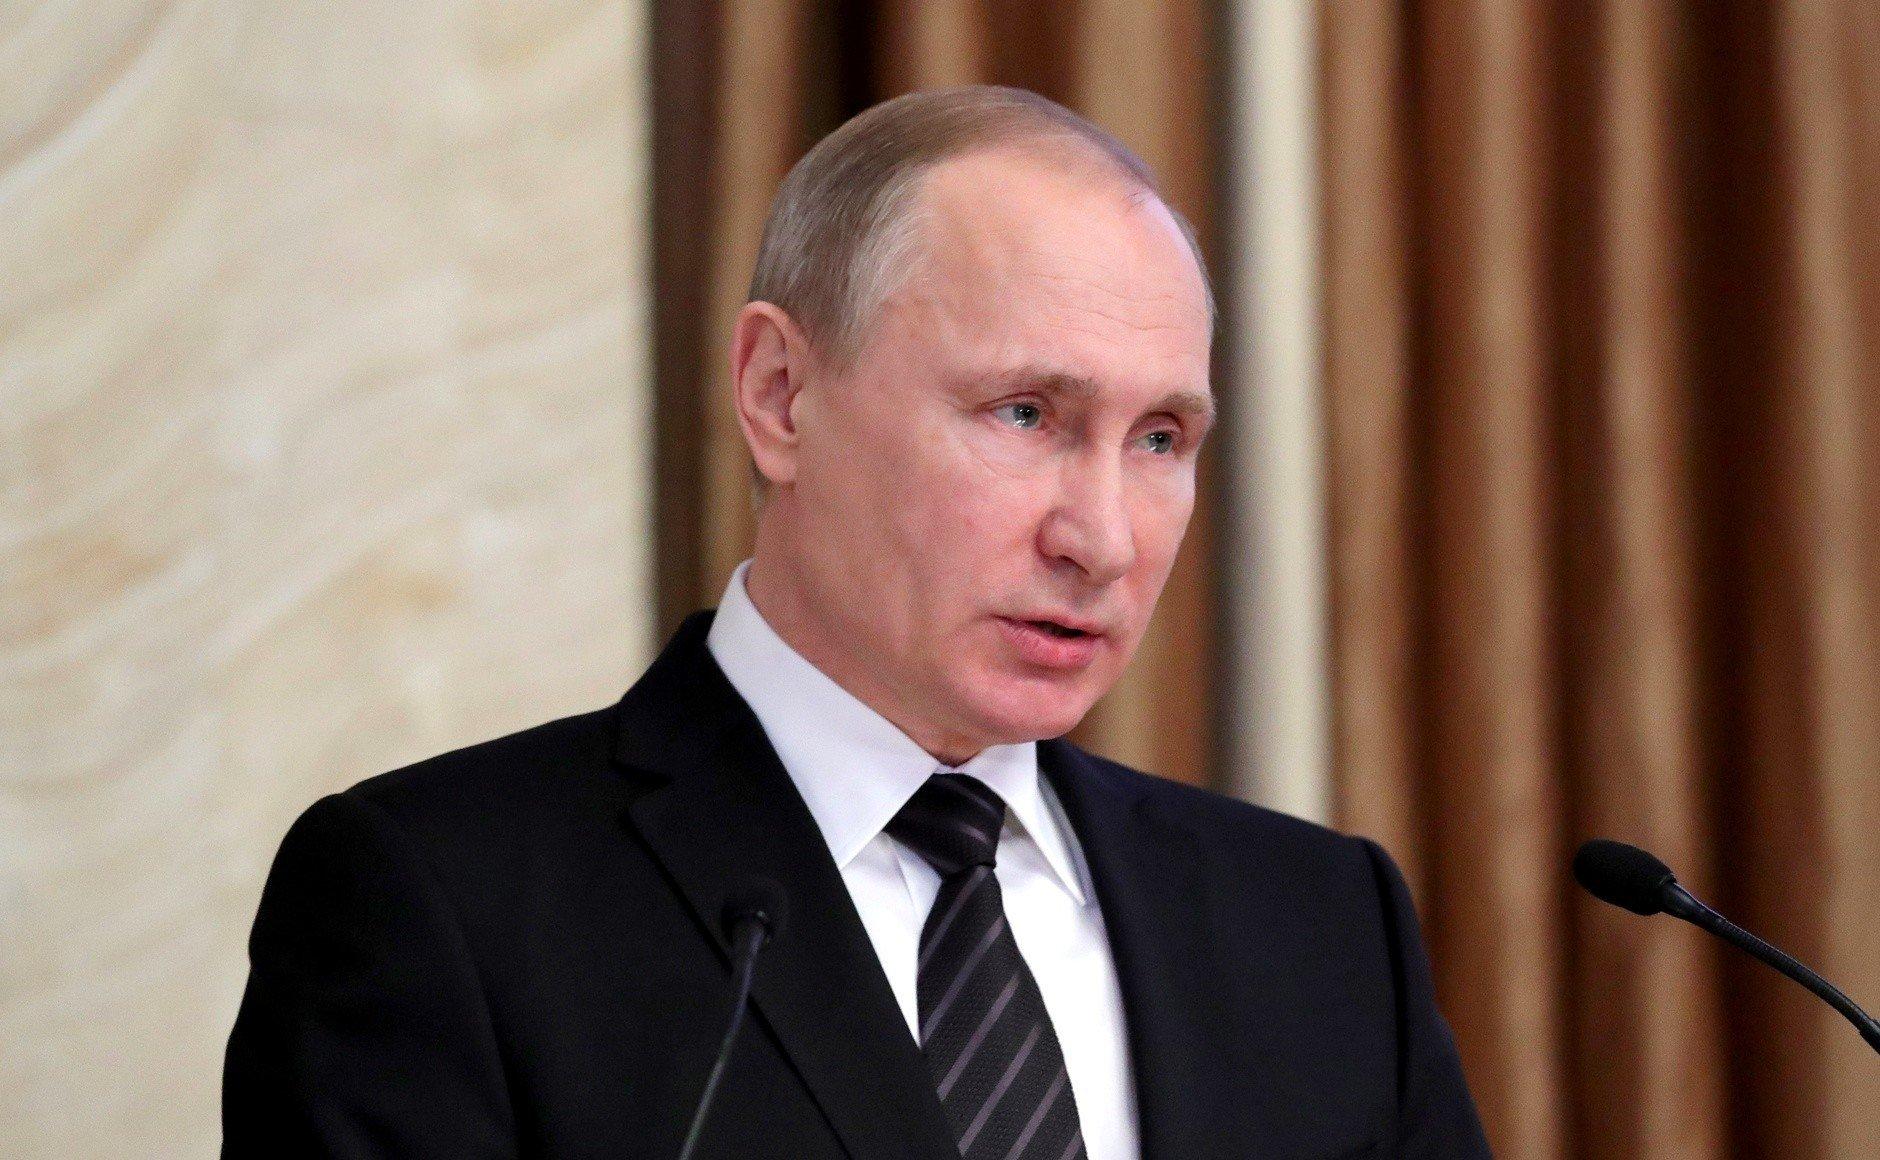 Как выглядит дворец Путина изнутри - фото